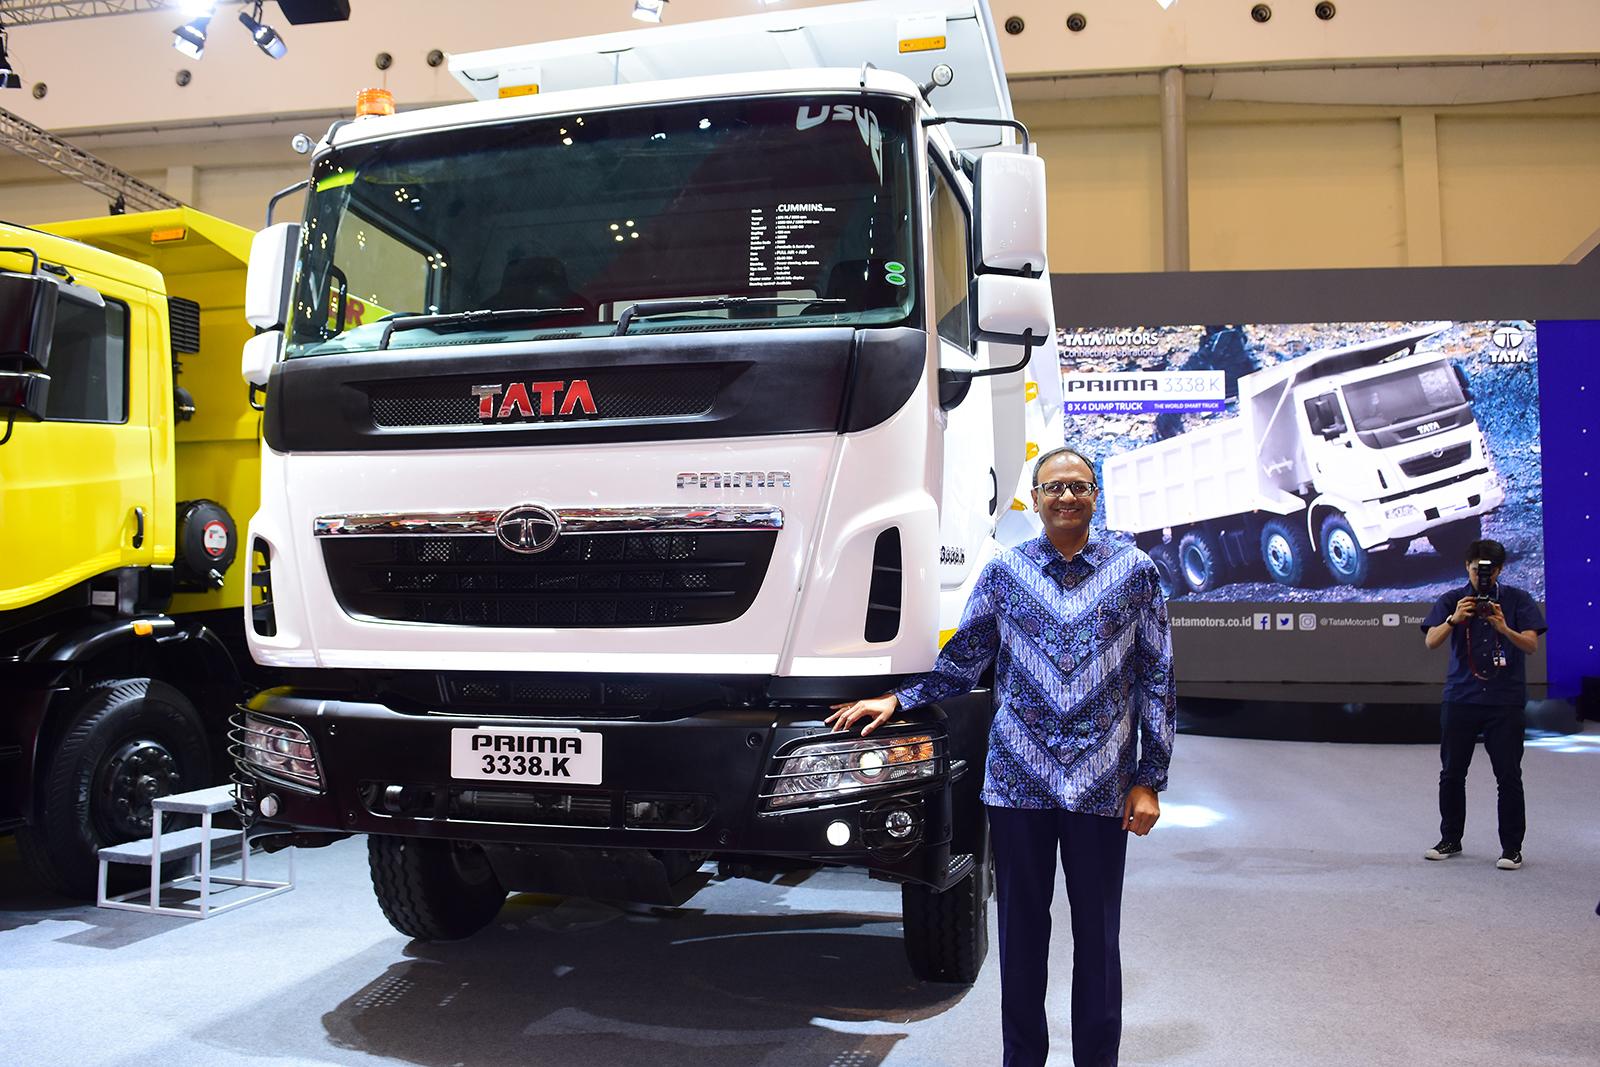 Tata Prima 3338.K Jagoan Baru Tata Motors di Konstruksi dan Logistik